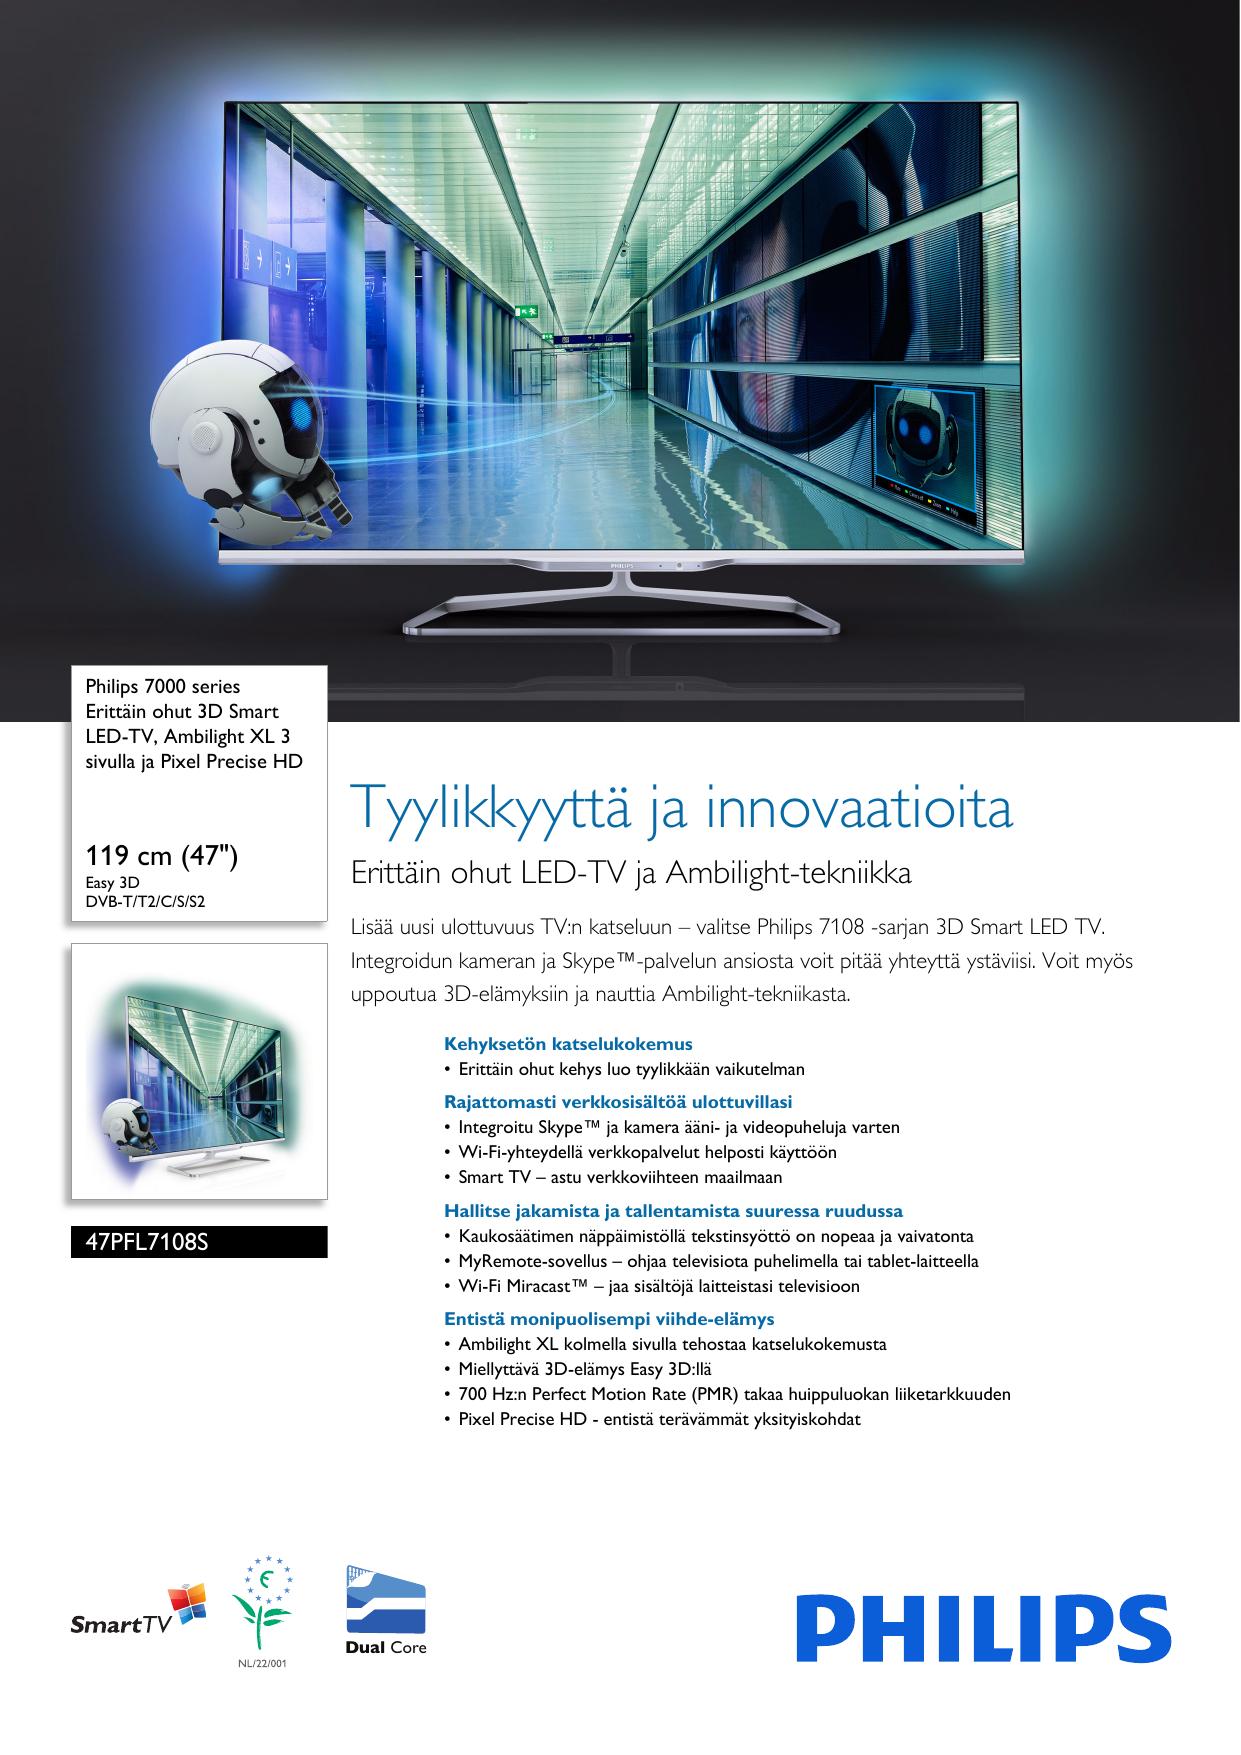 philips smart tv user manual pdf